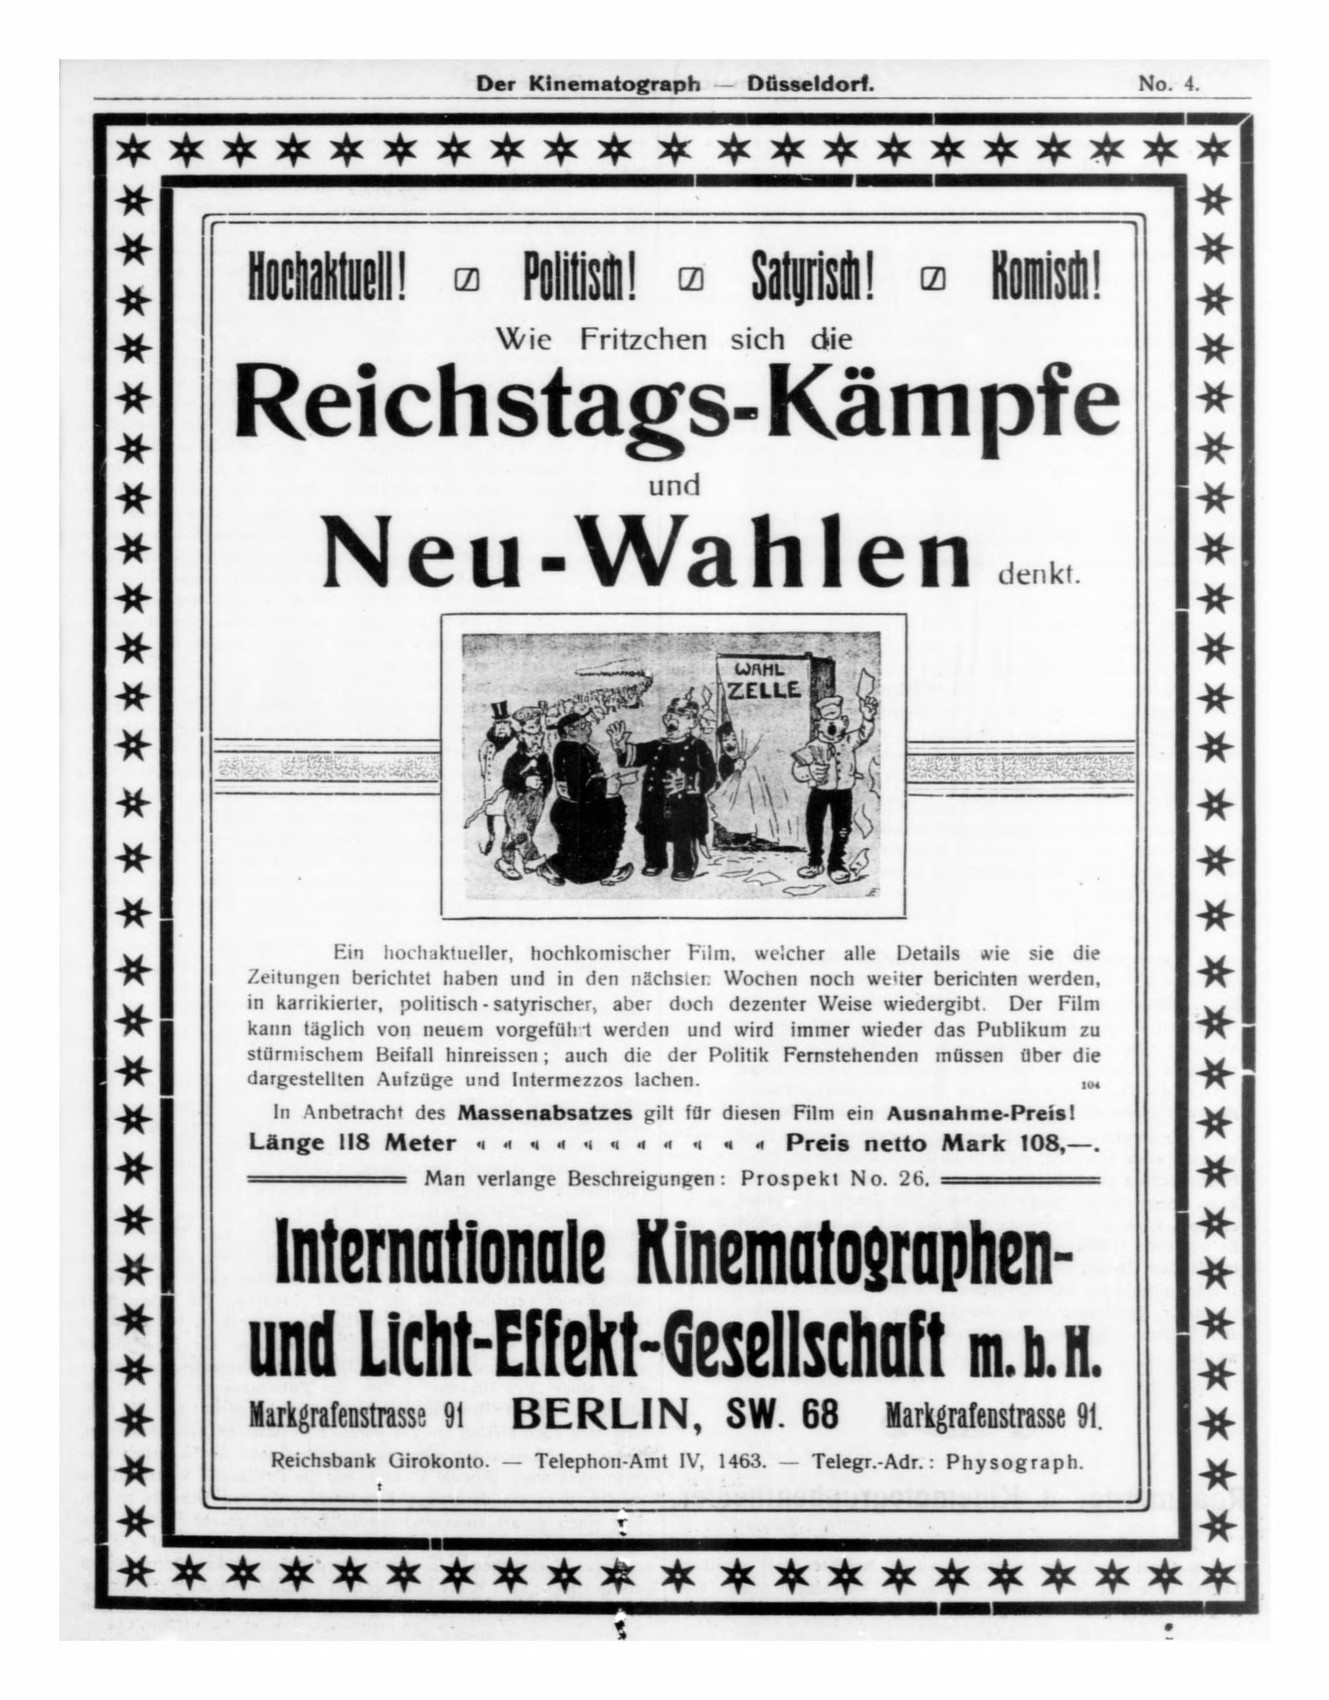 Kinematograph01-1907-01_jp2.zip&file=kinematograph01-1907-01_jp2%2fkinematograph01-1907-01_0038